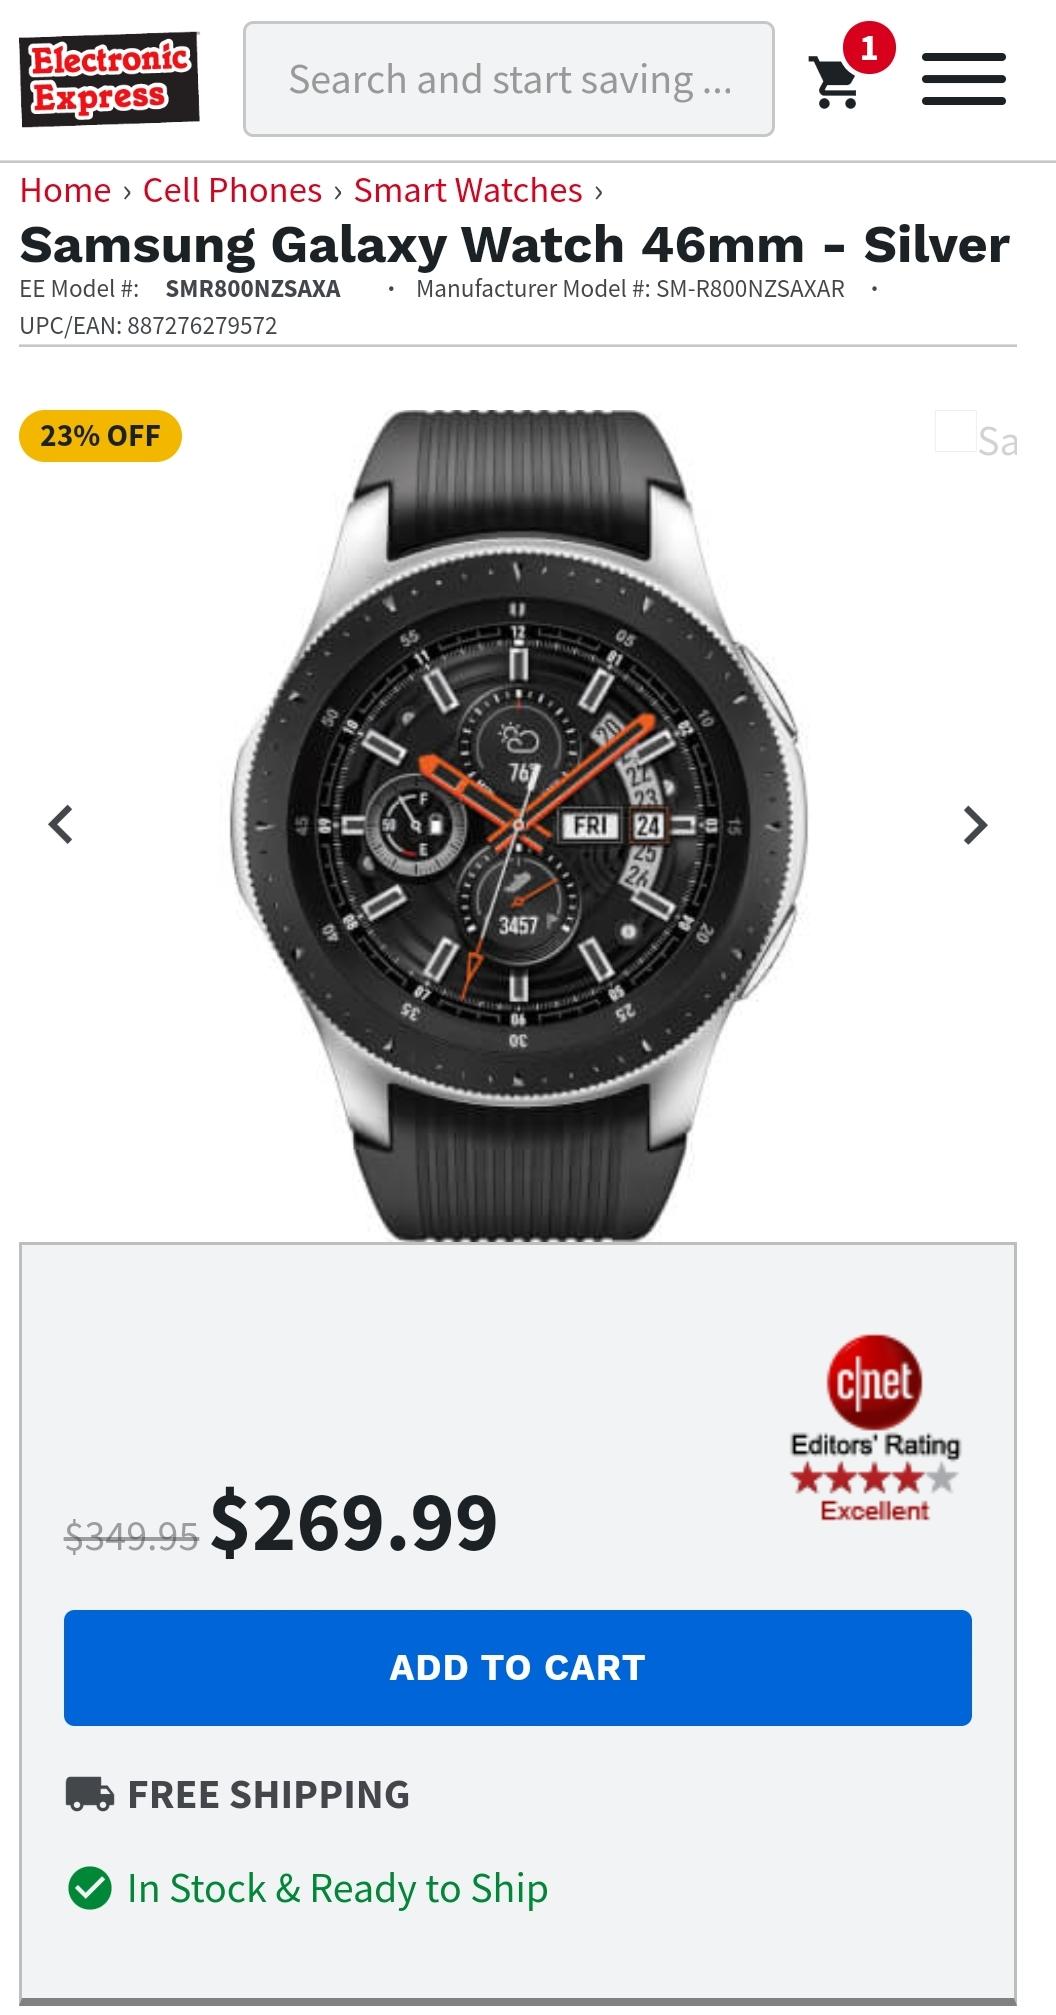 Samsung Galaxy Watch Smartwatch 46mm no tax $269.99